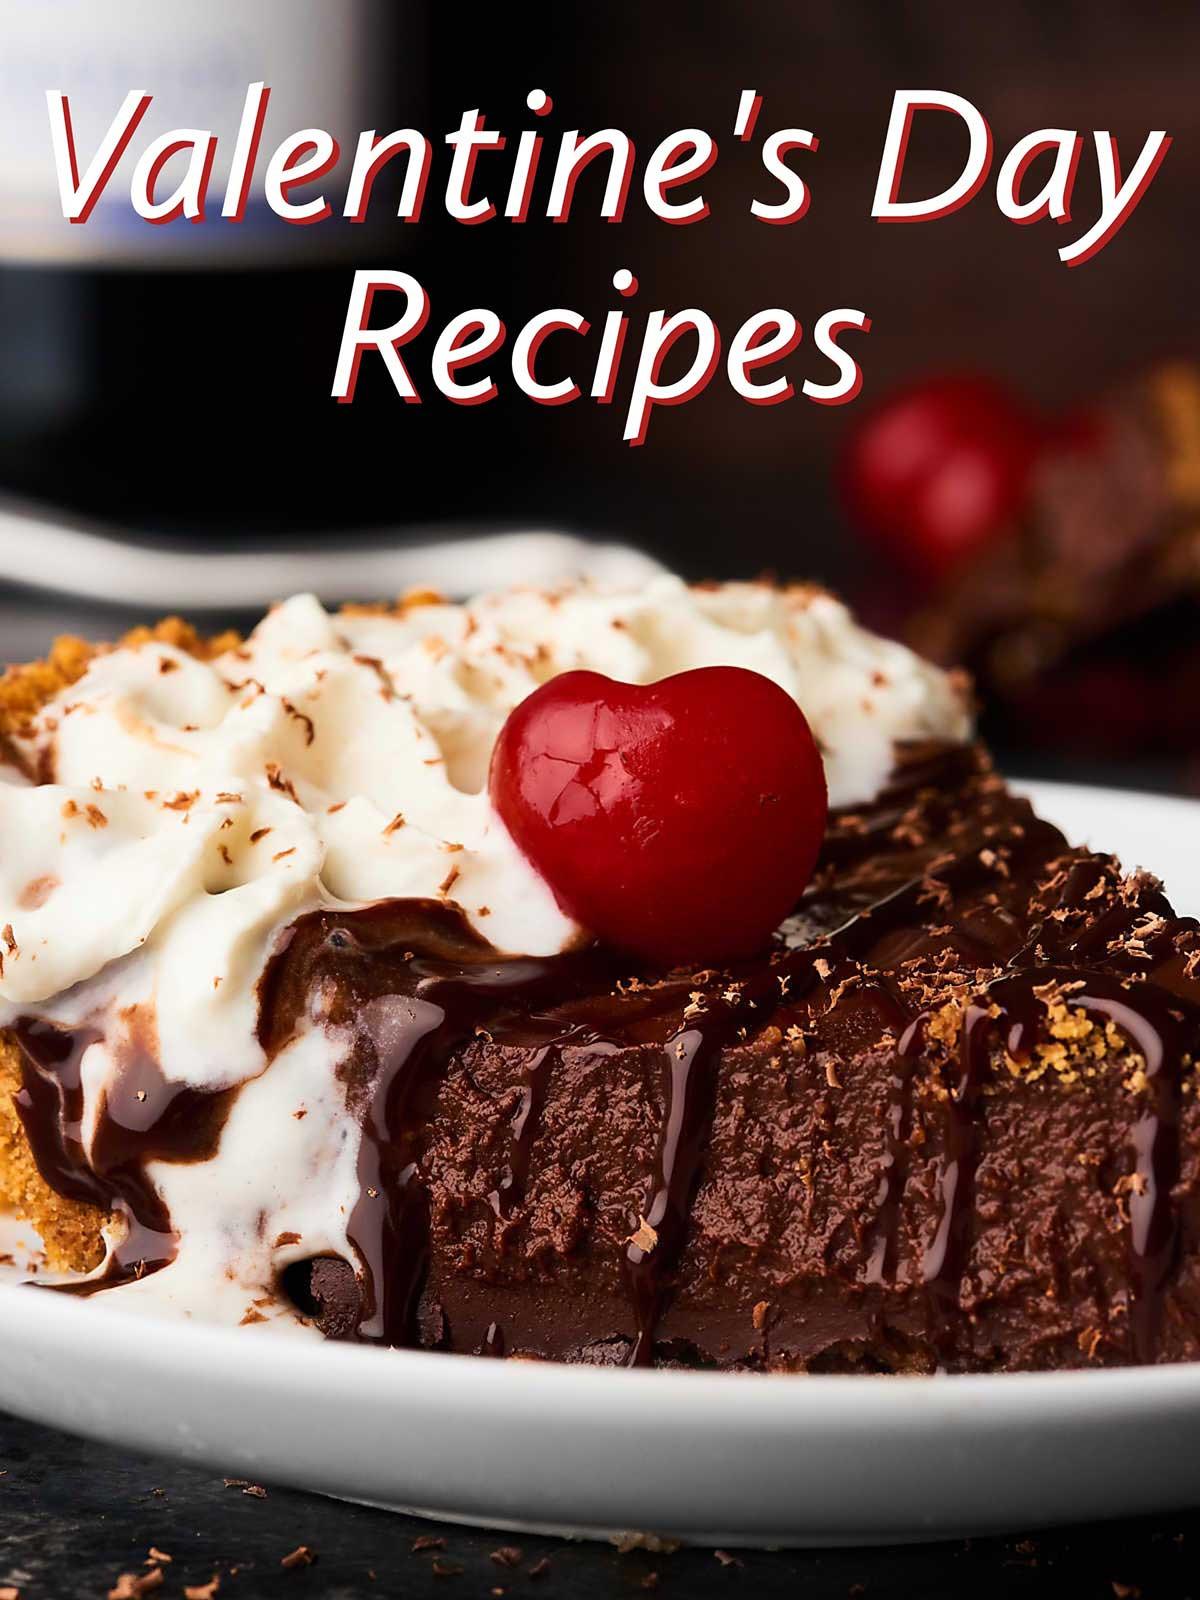 Valentine Day Recipes Dessert  Easy Valentine s Day Recipes 2017 Show Me the Yummy